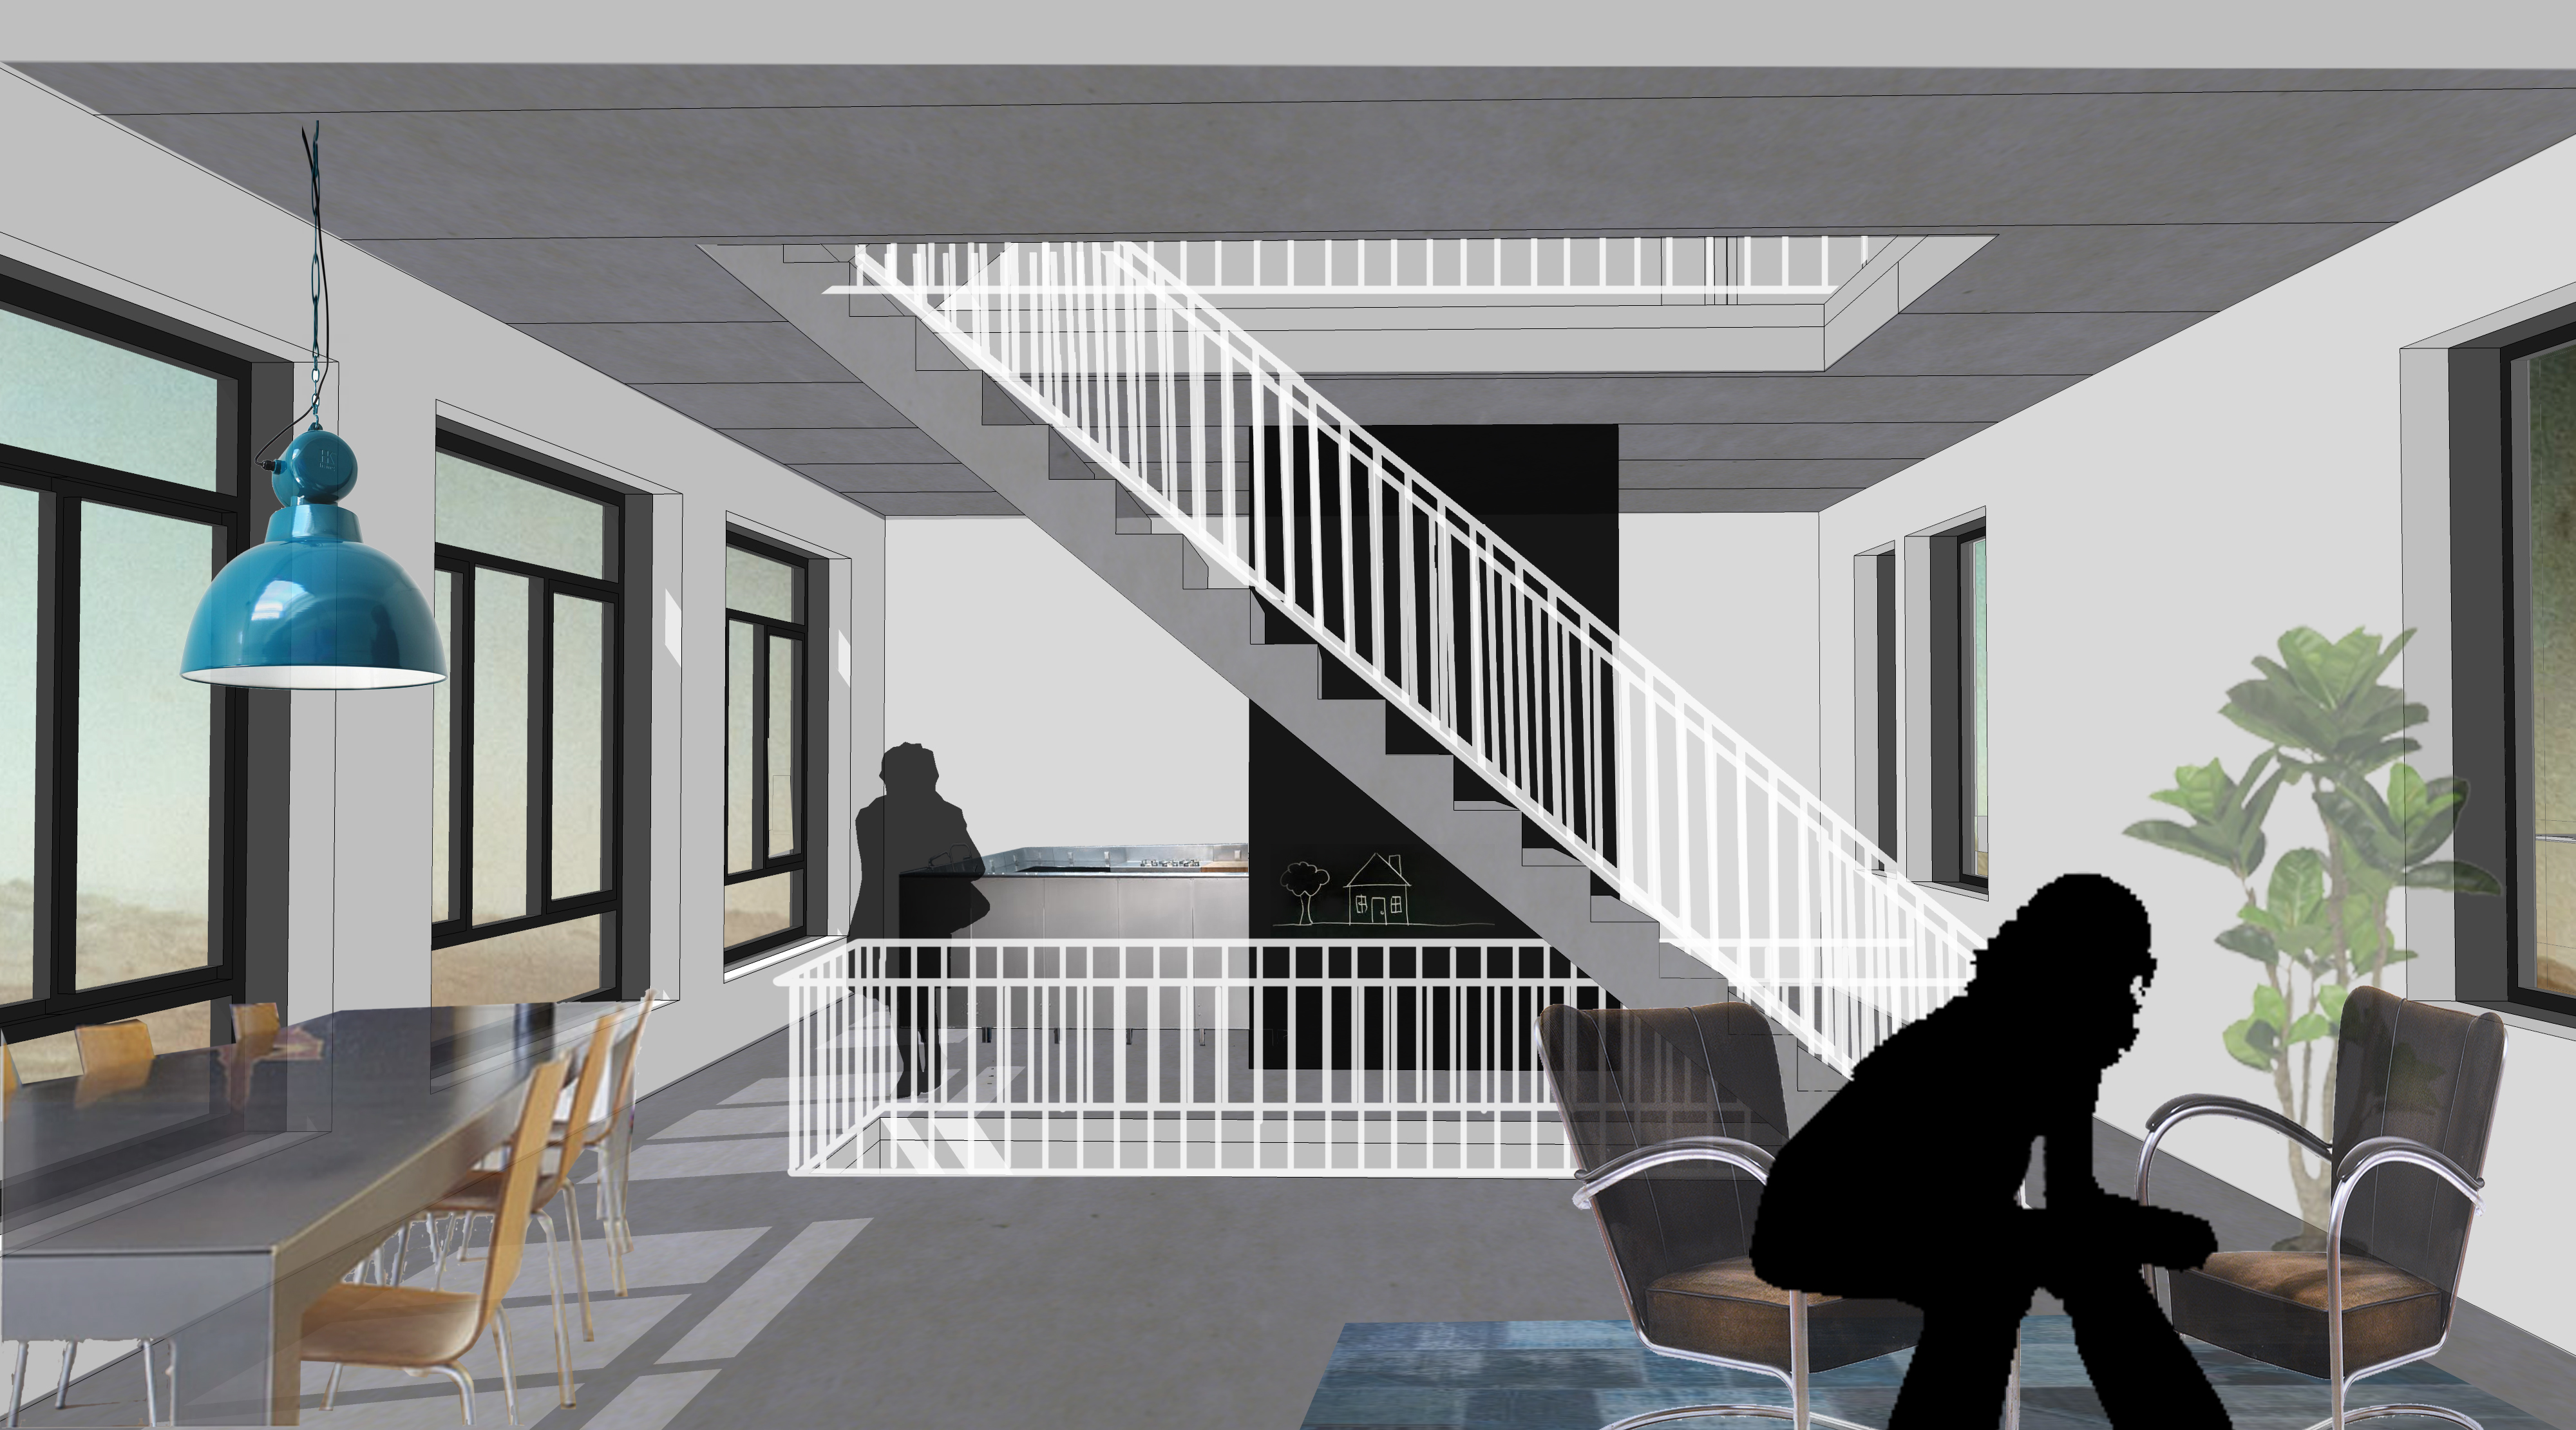 interieur modern woonhuis nieuwbouw architect